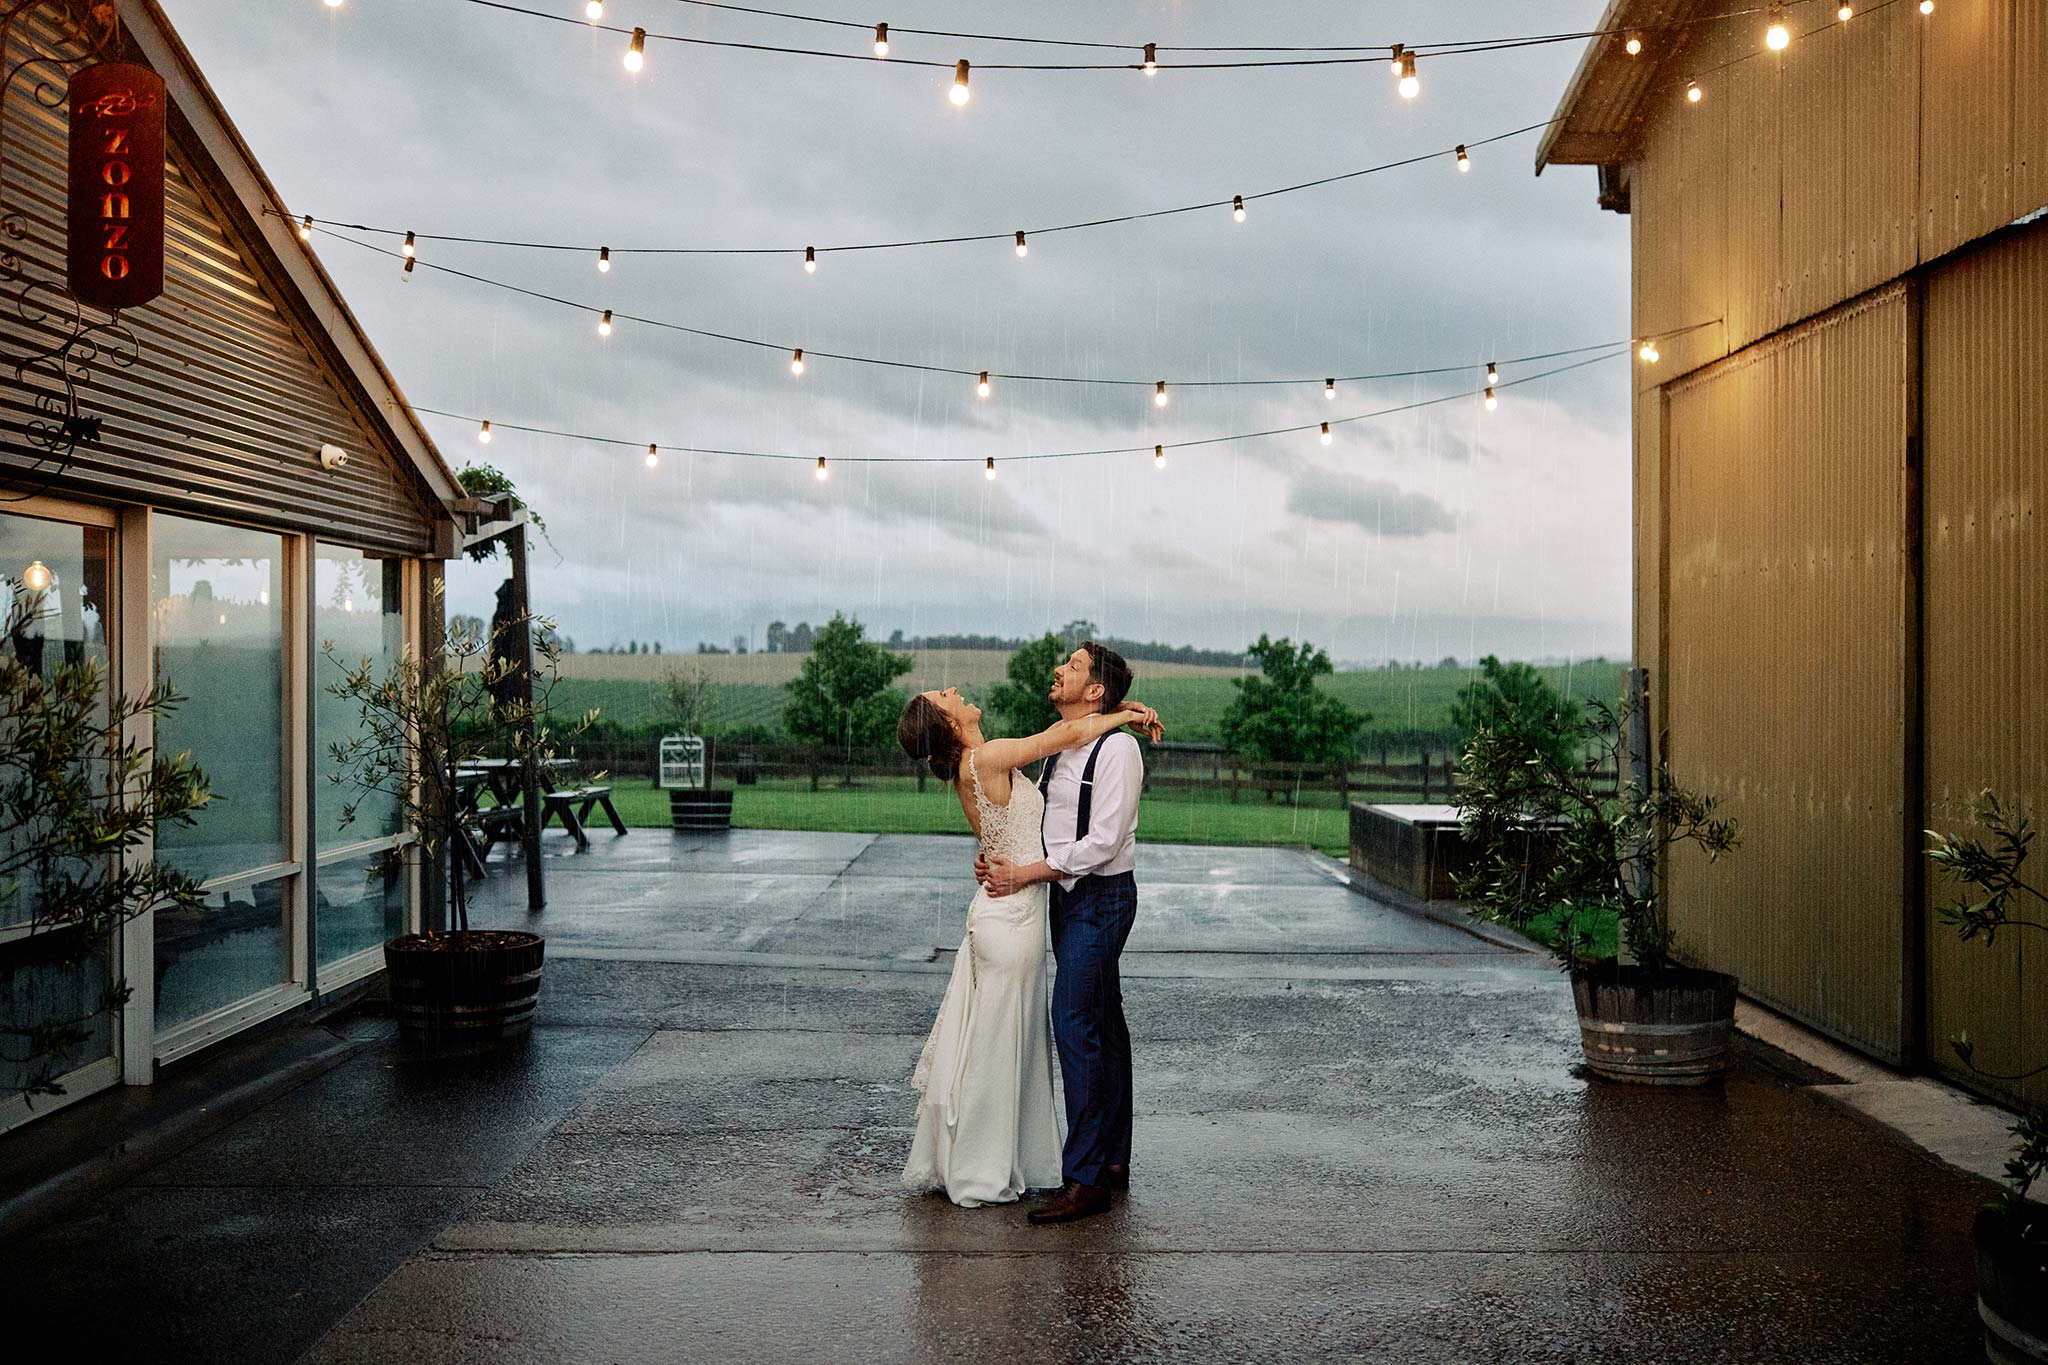 zonzo wedding photography reception bride groom portrait in rain